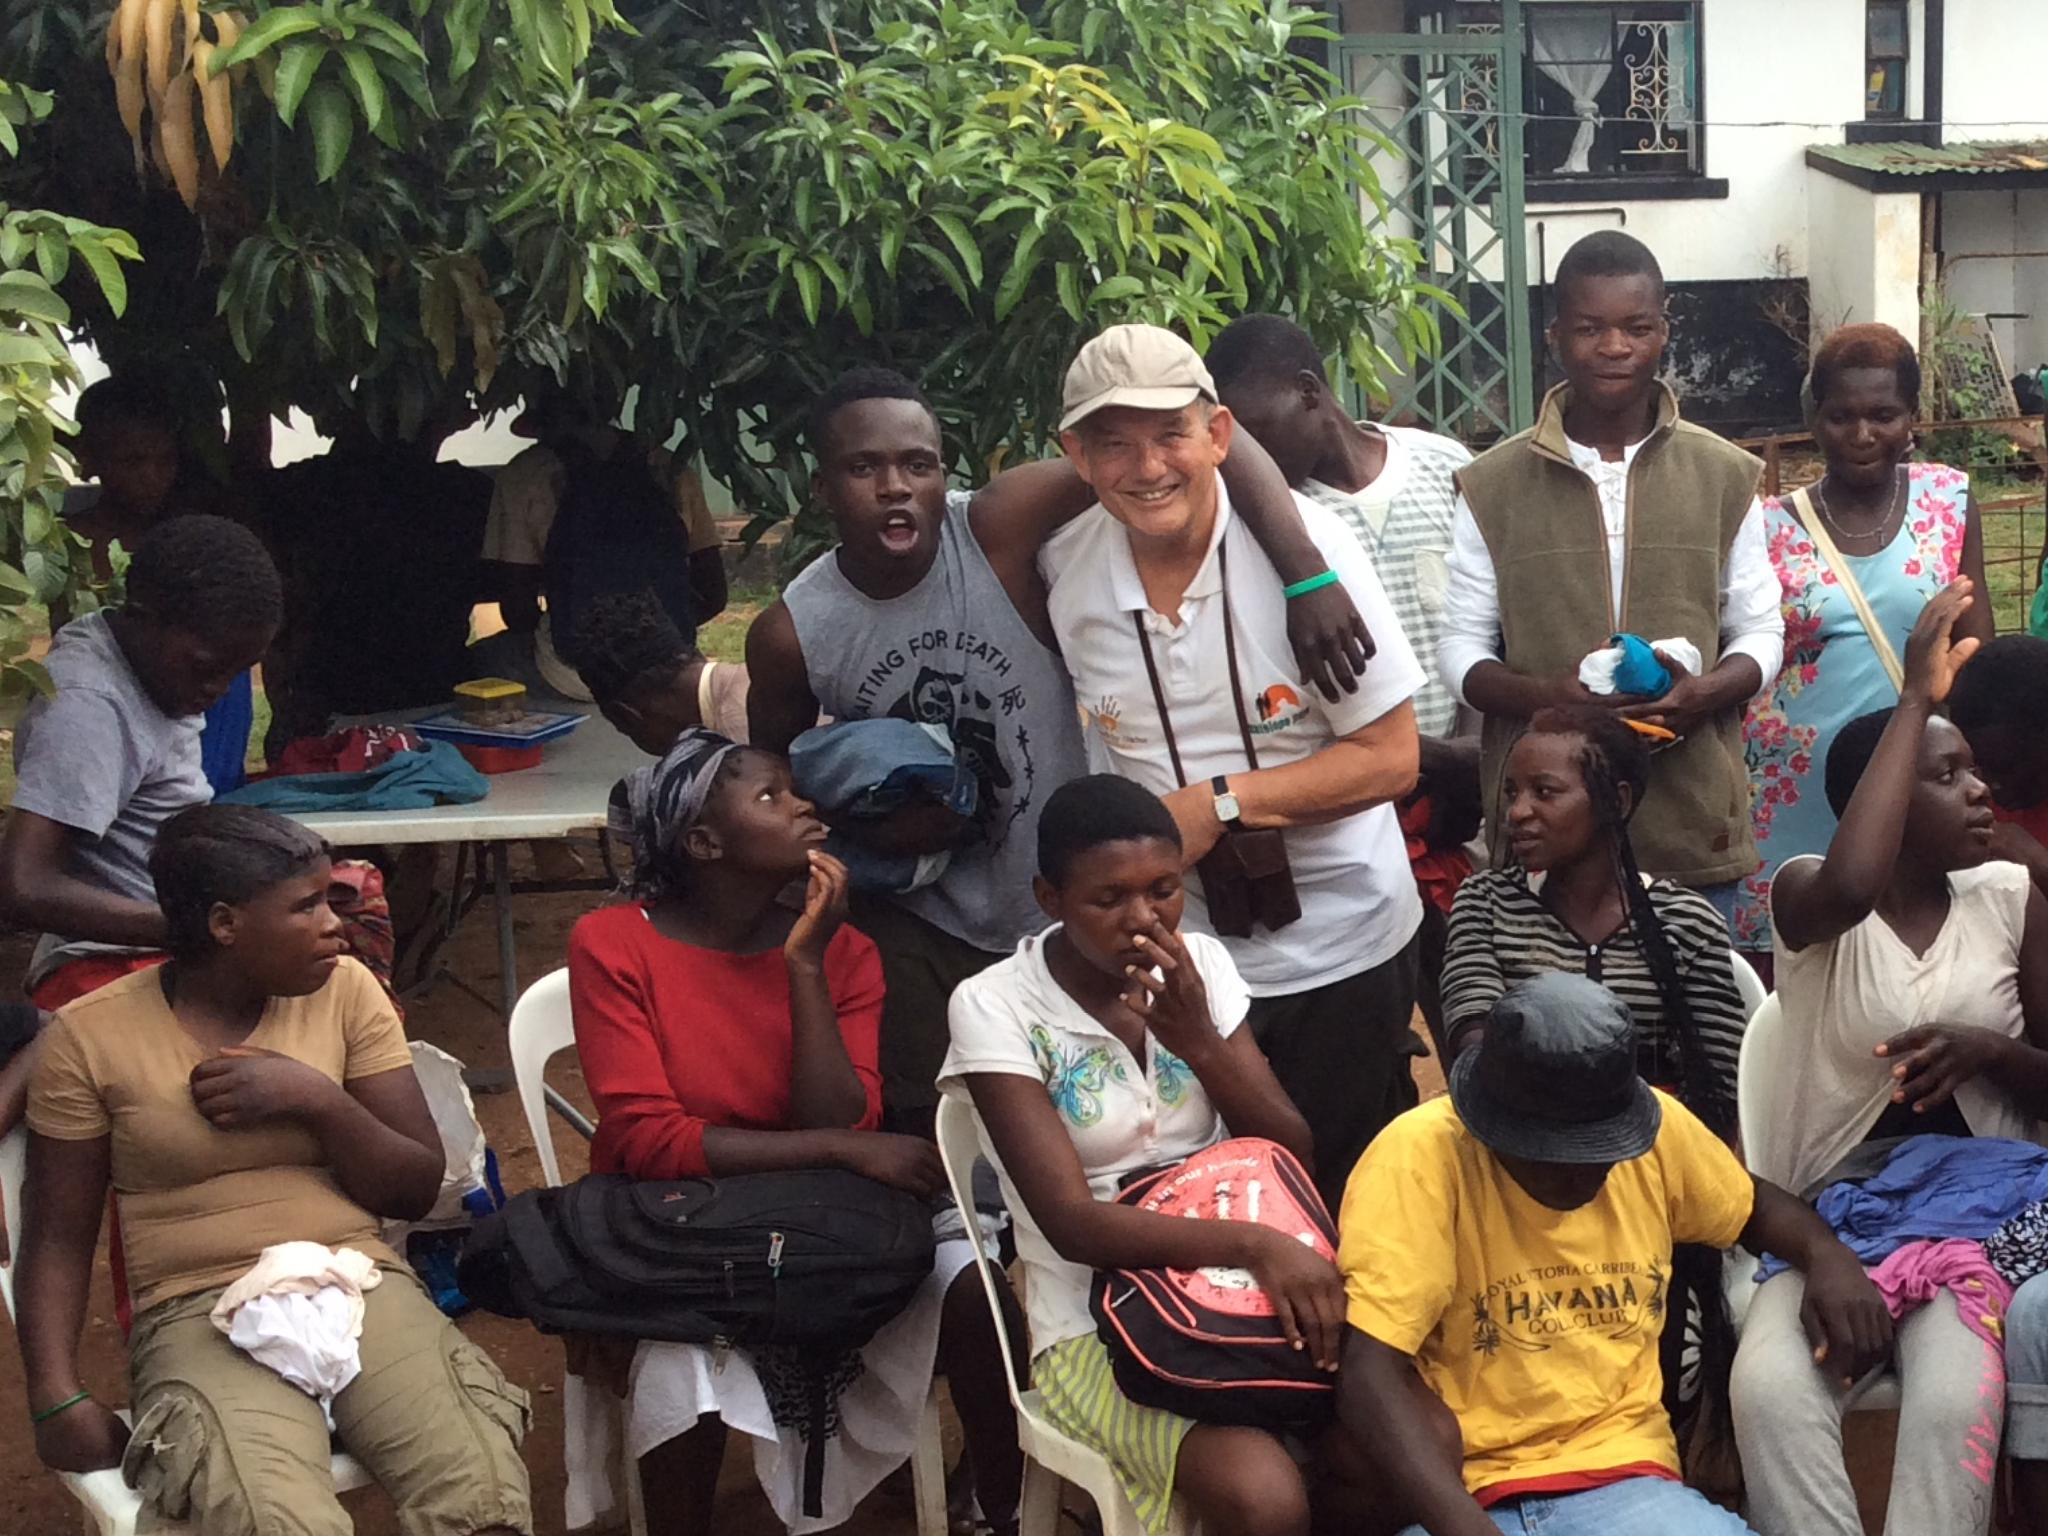 Alan Calder-McNicoll, on a visit to Zimbabwe